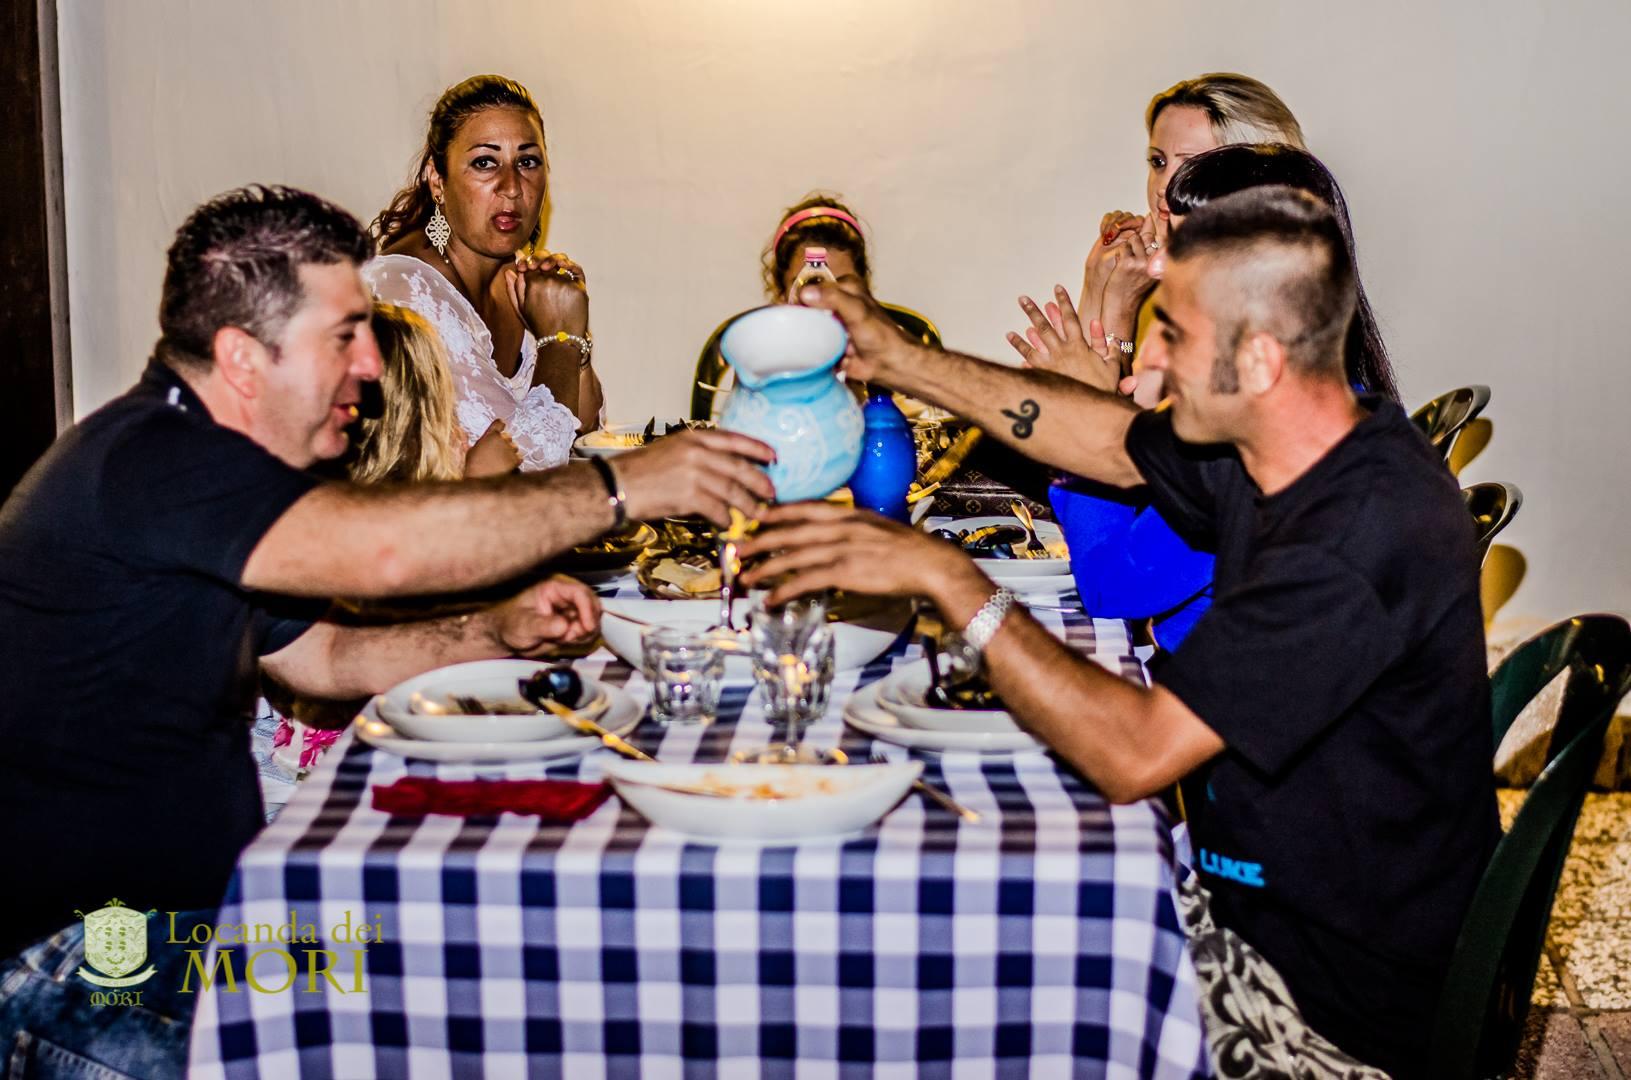 mangiare bene Locanda dei Mori Santa Teresa Gallura